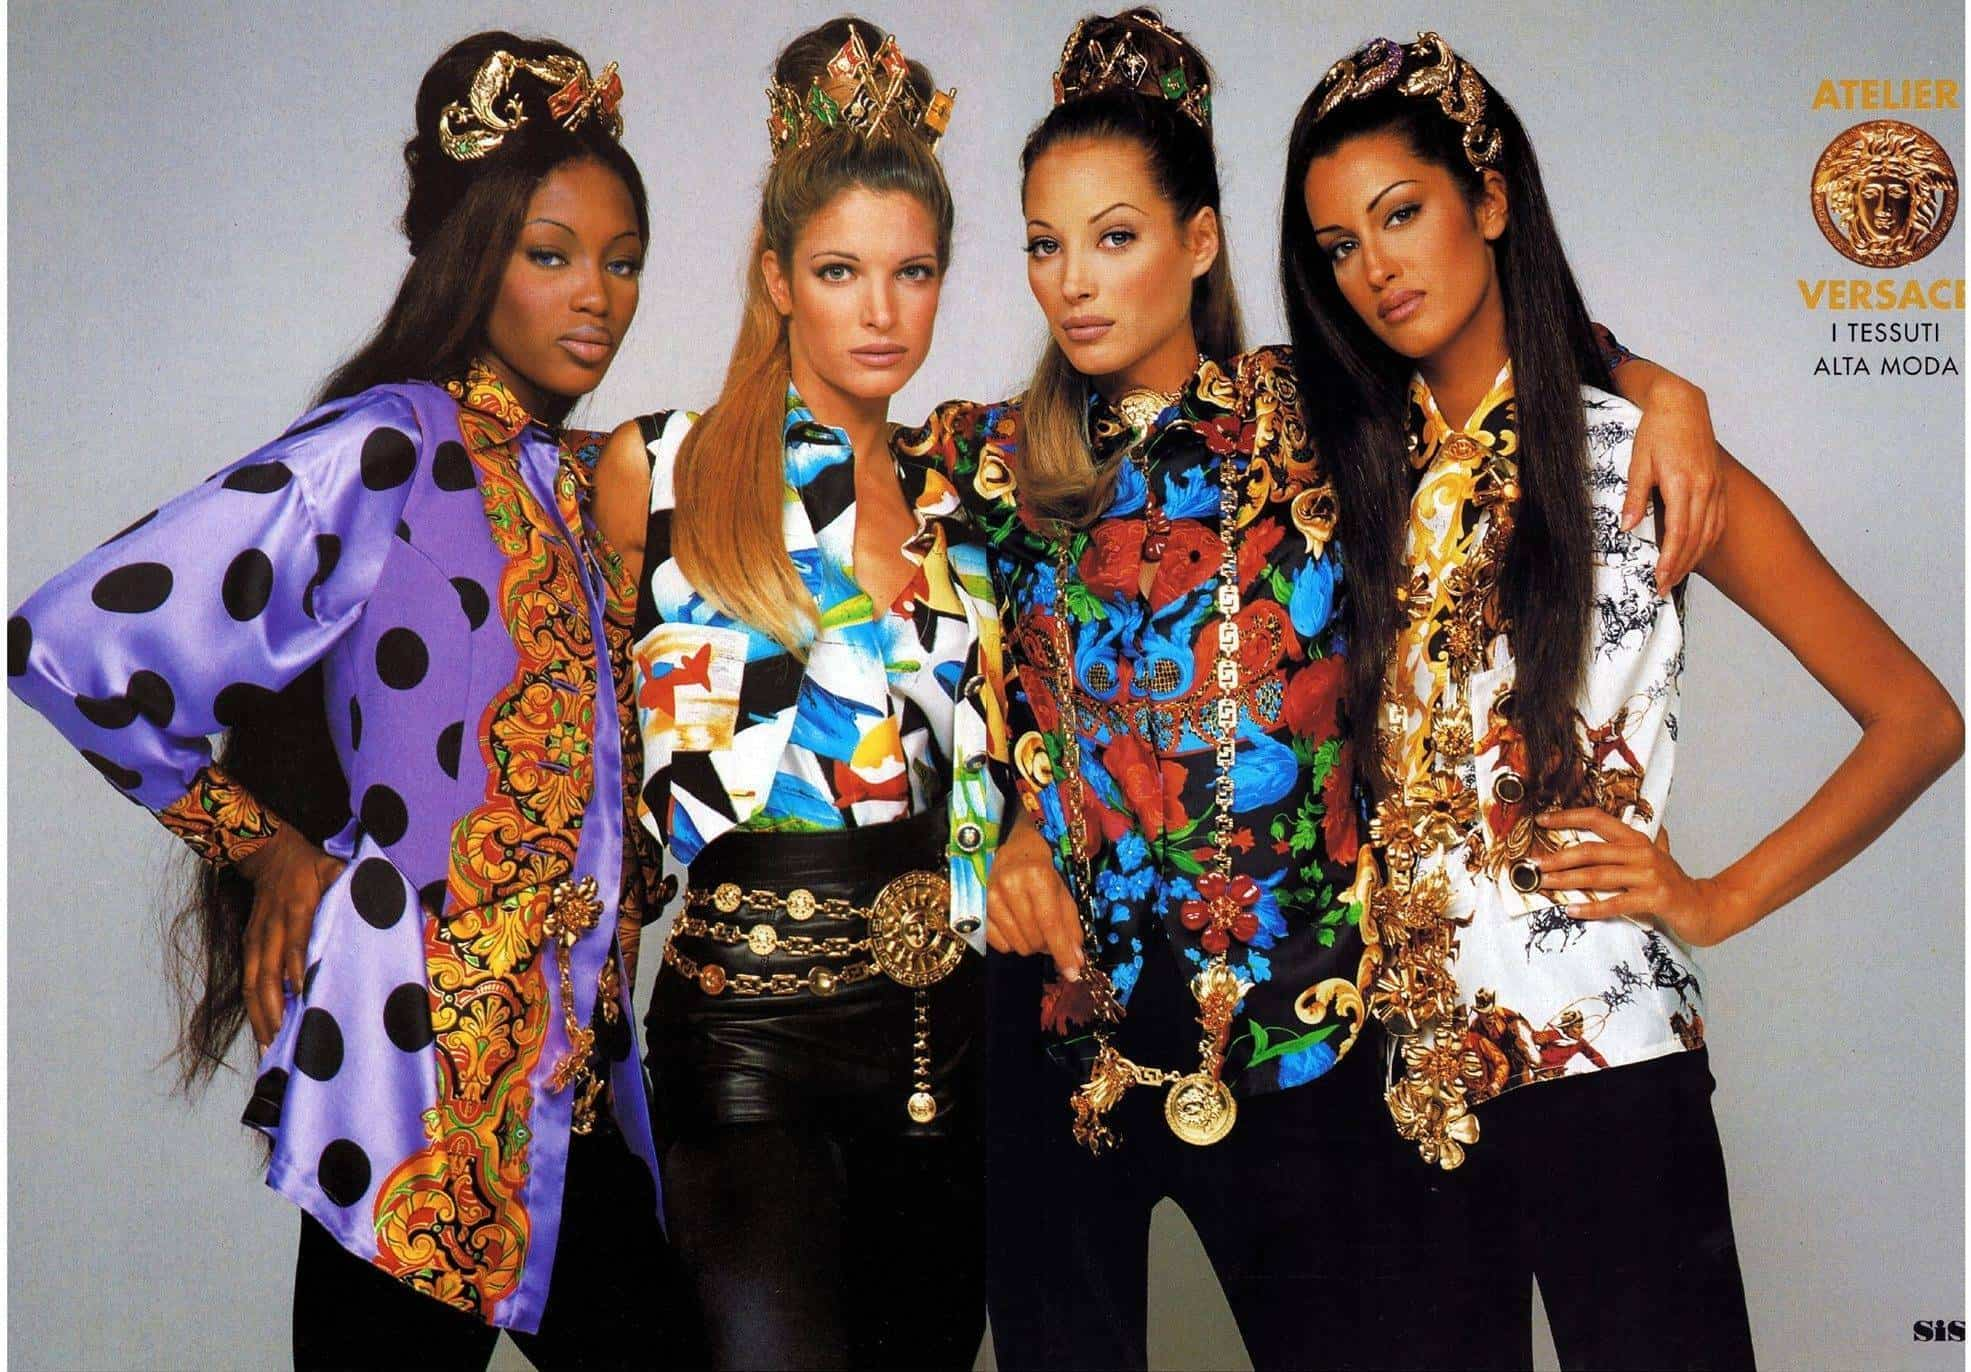 Versace – Iconic Luxury